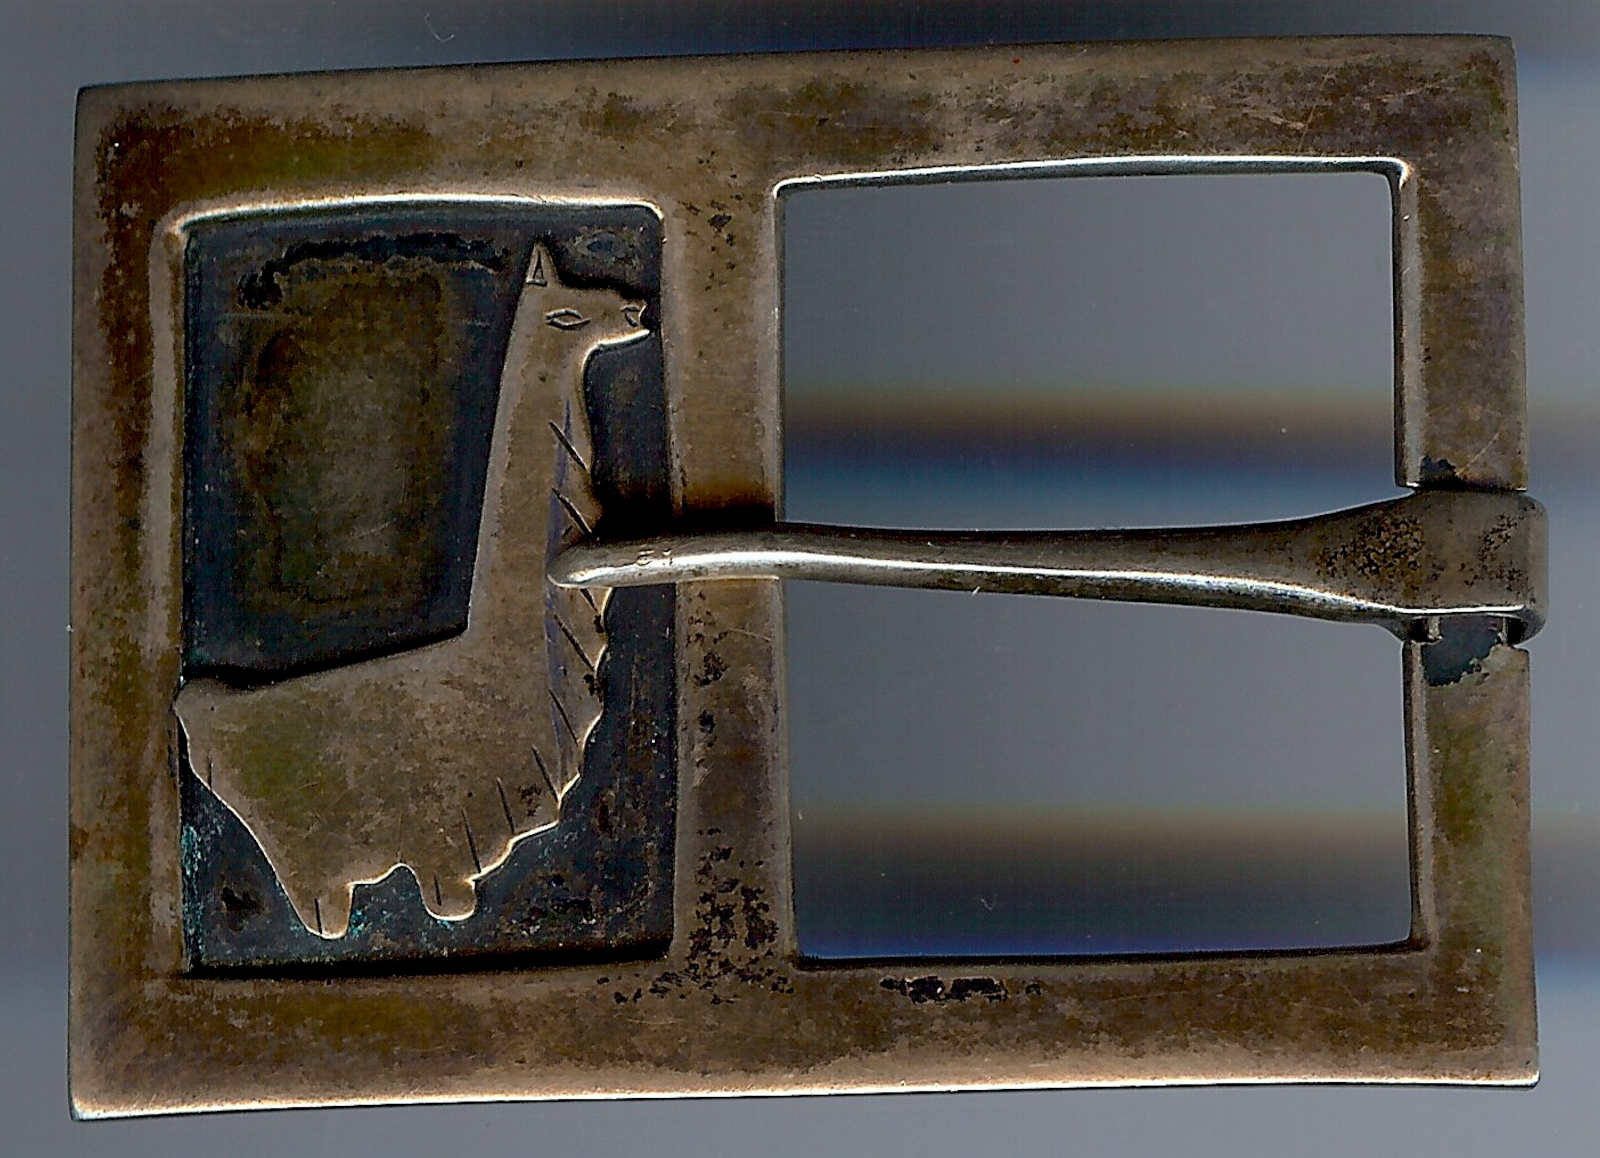 Vintage Laffi Laffi Laffi Perù argentoo Sterling Lama Fibbia Della Cintura 39d8b9